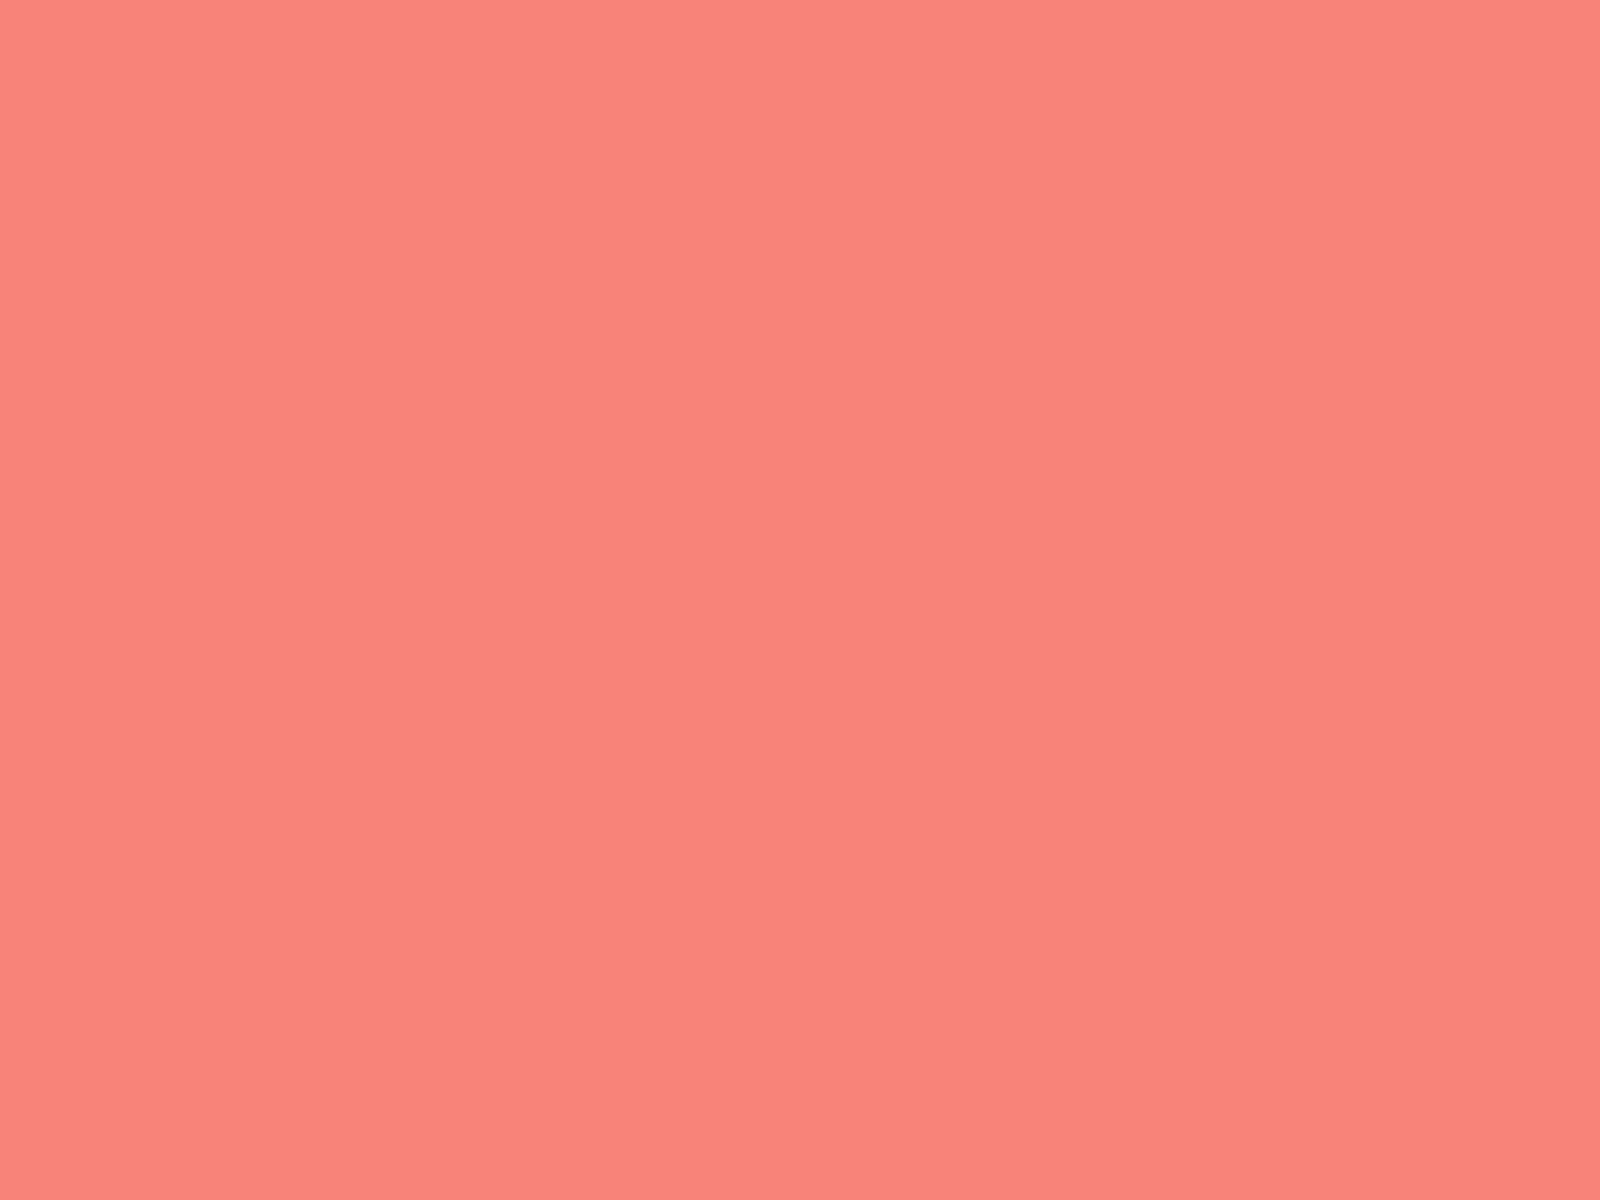 Pink Background Wallpaperdesktop In 1366x768 Hd Picture 1600x1200